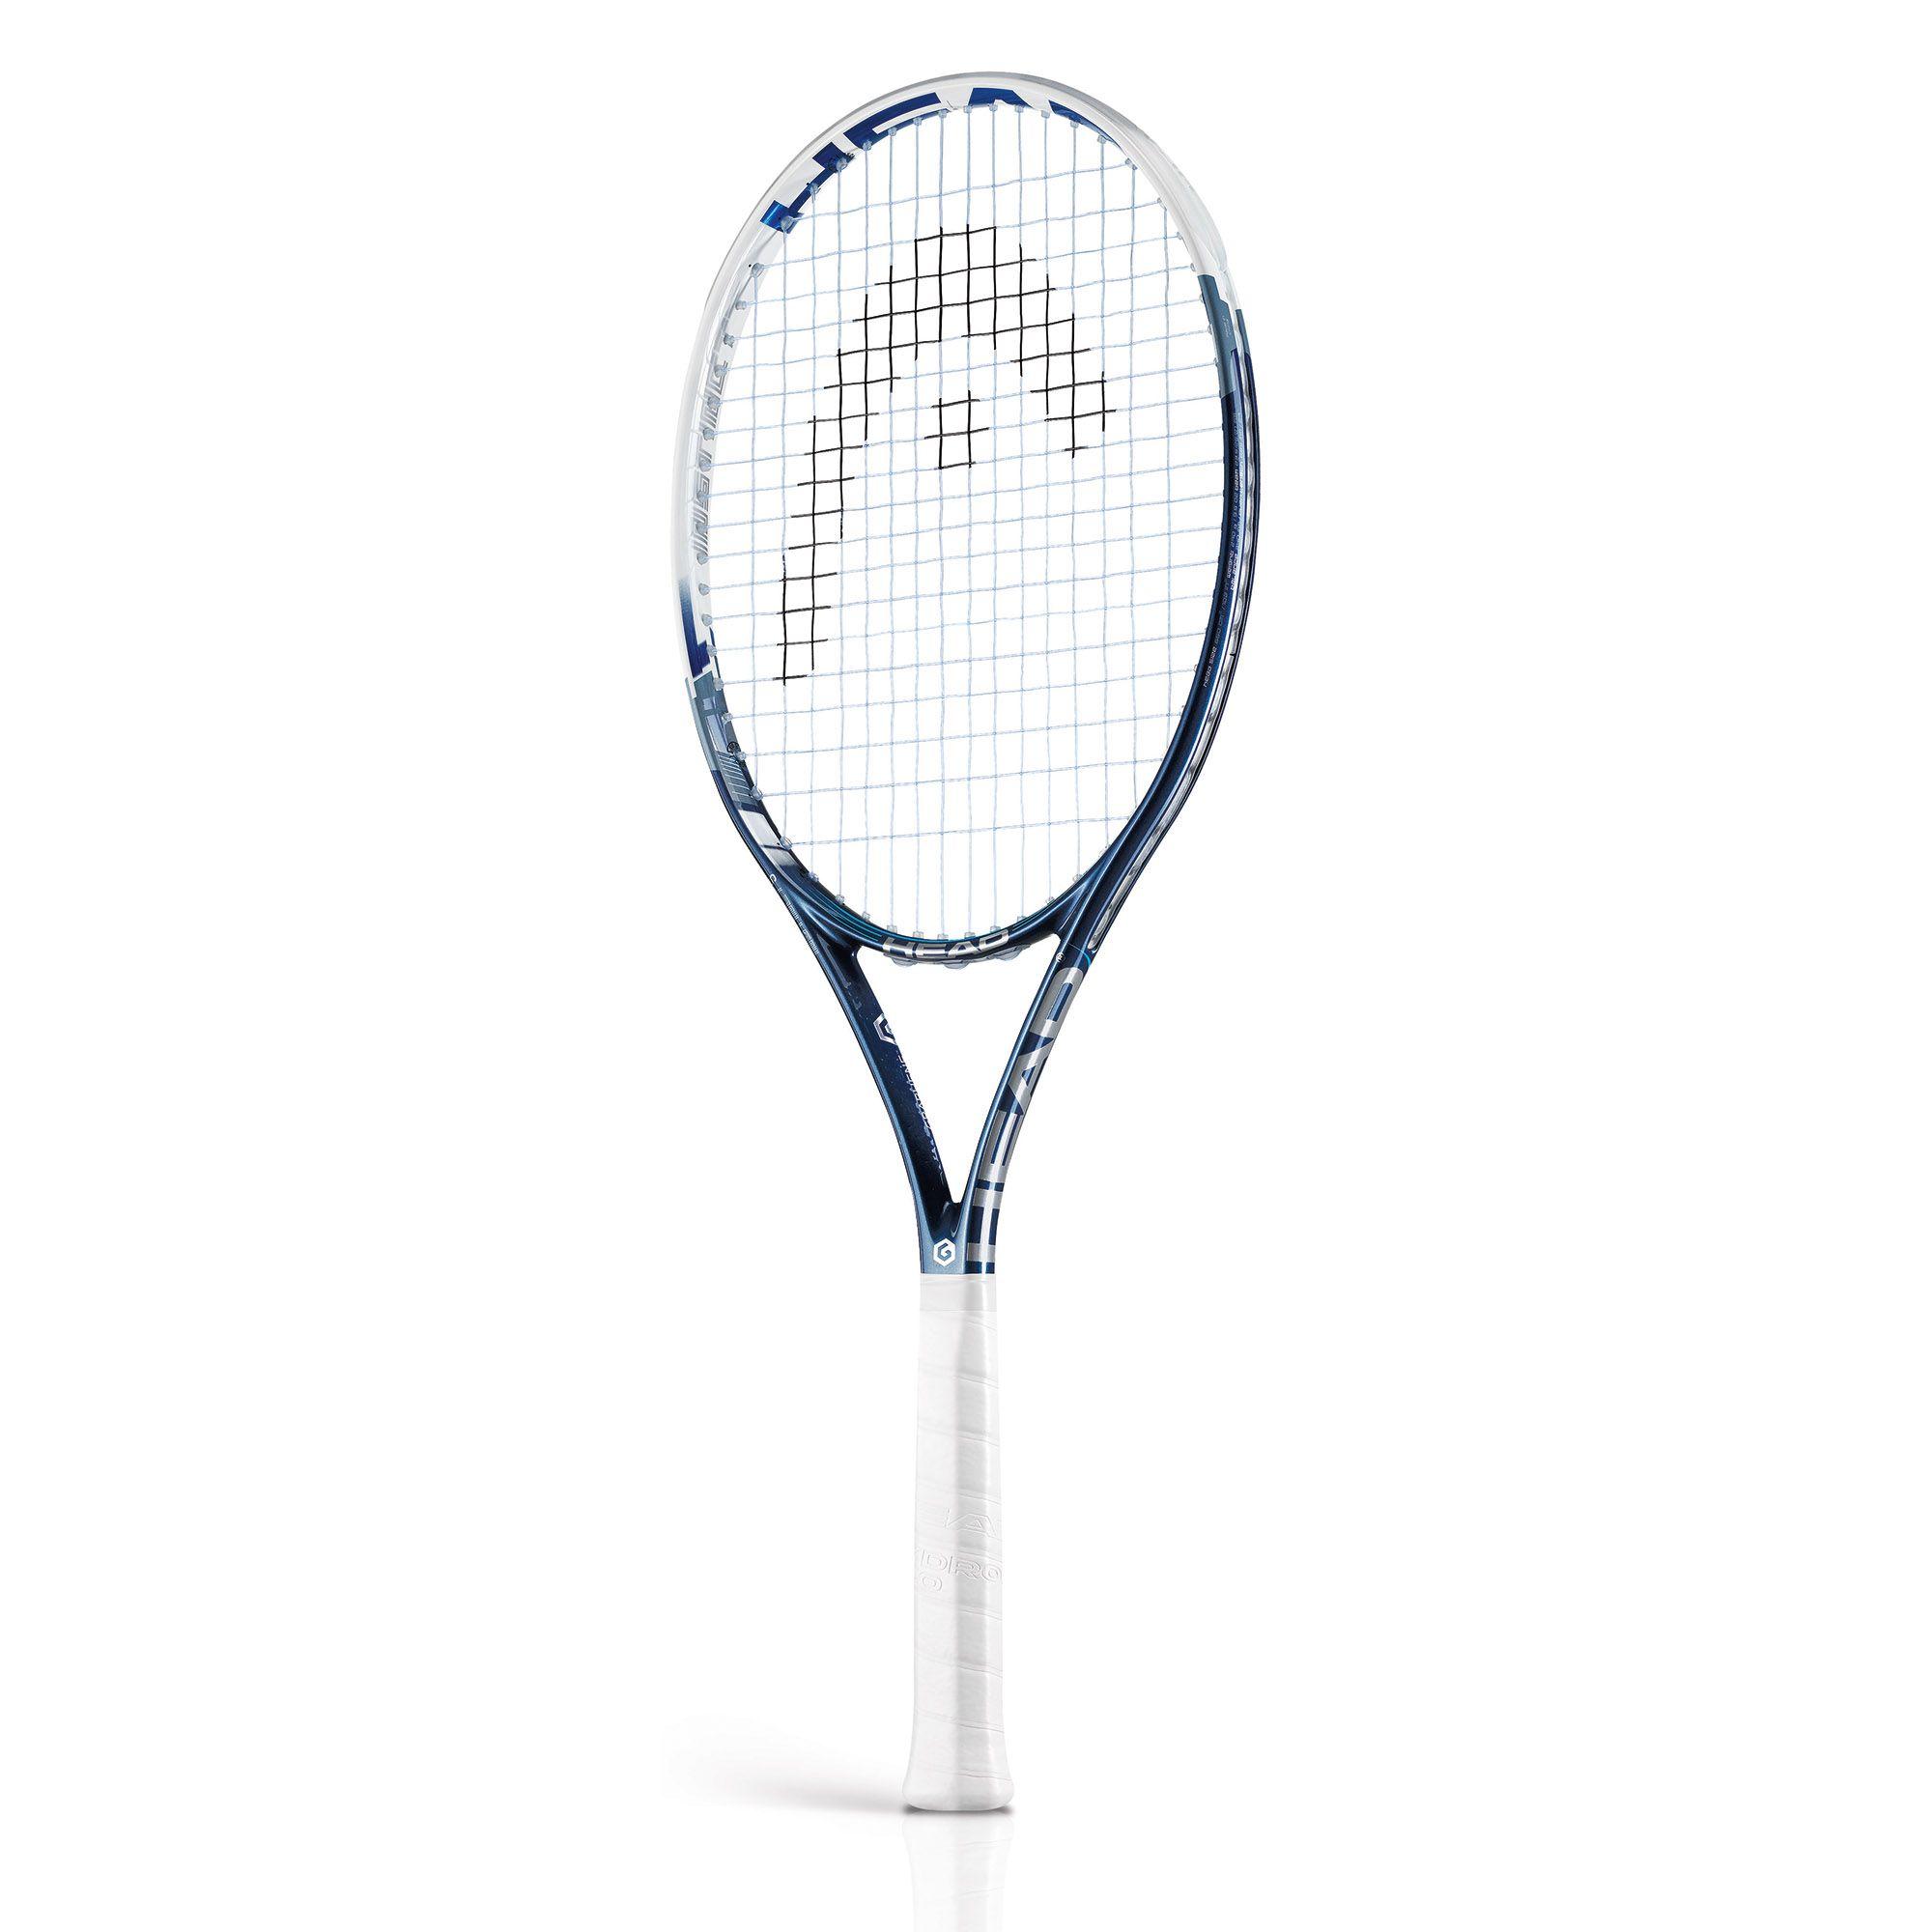 Head YouTek Graphene Instinct S Tennis Racket - Sweatband.com